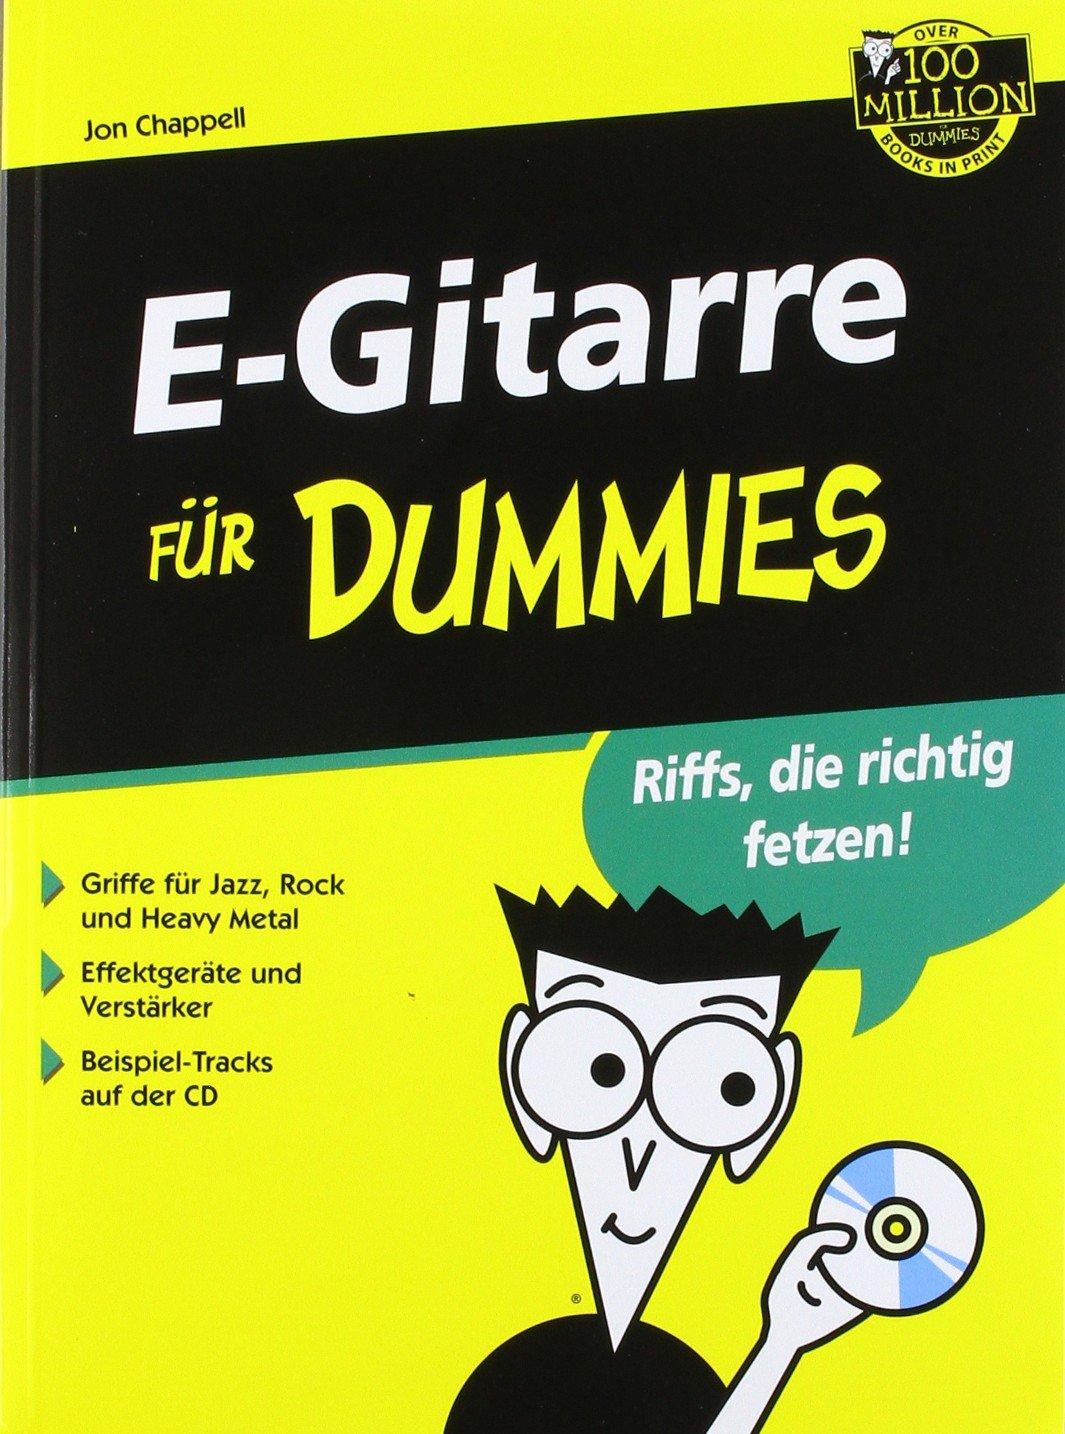 E-Gitarre für Dummies: Amazon.de: Jon Chappell: Bücher